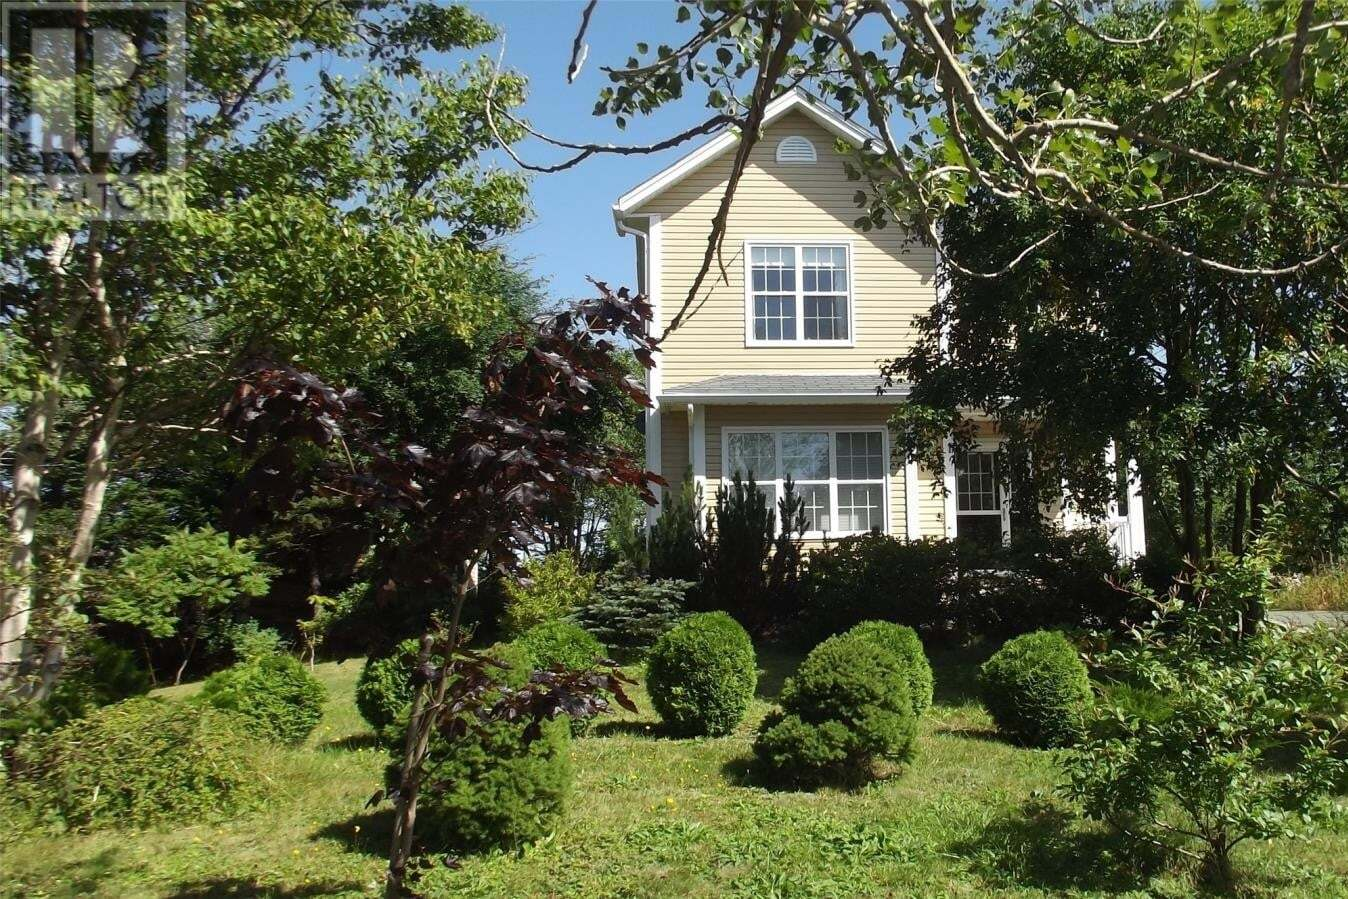 House for sale at 1 Hazeldale Rd Holyrood Newfoundland - MLS: 1219532